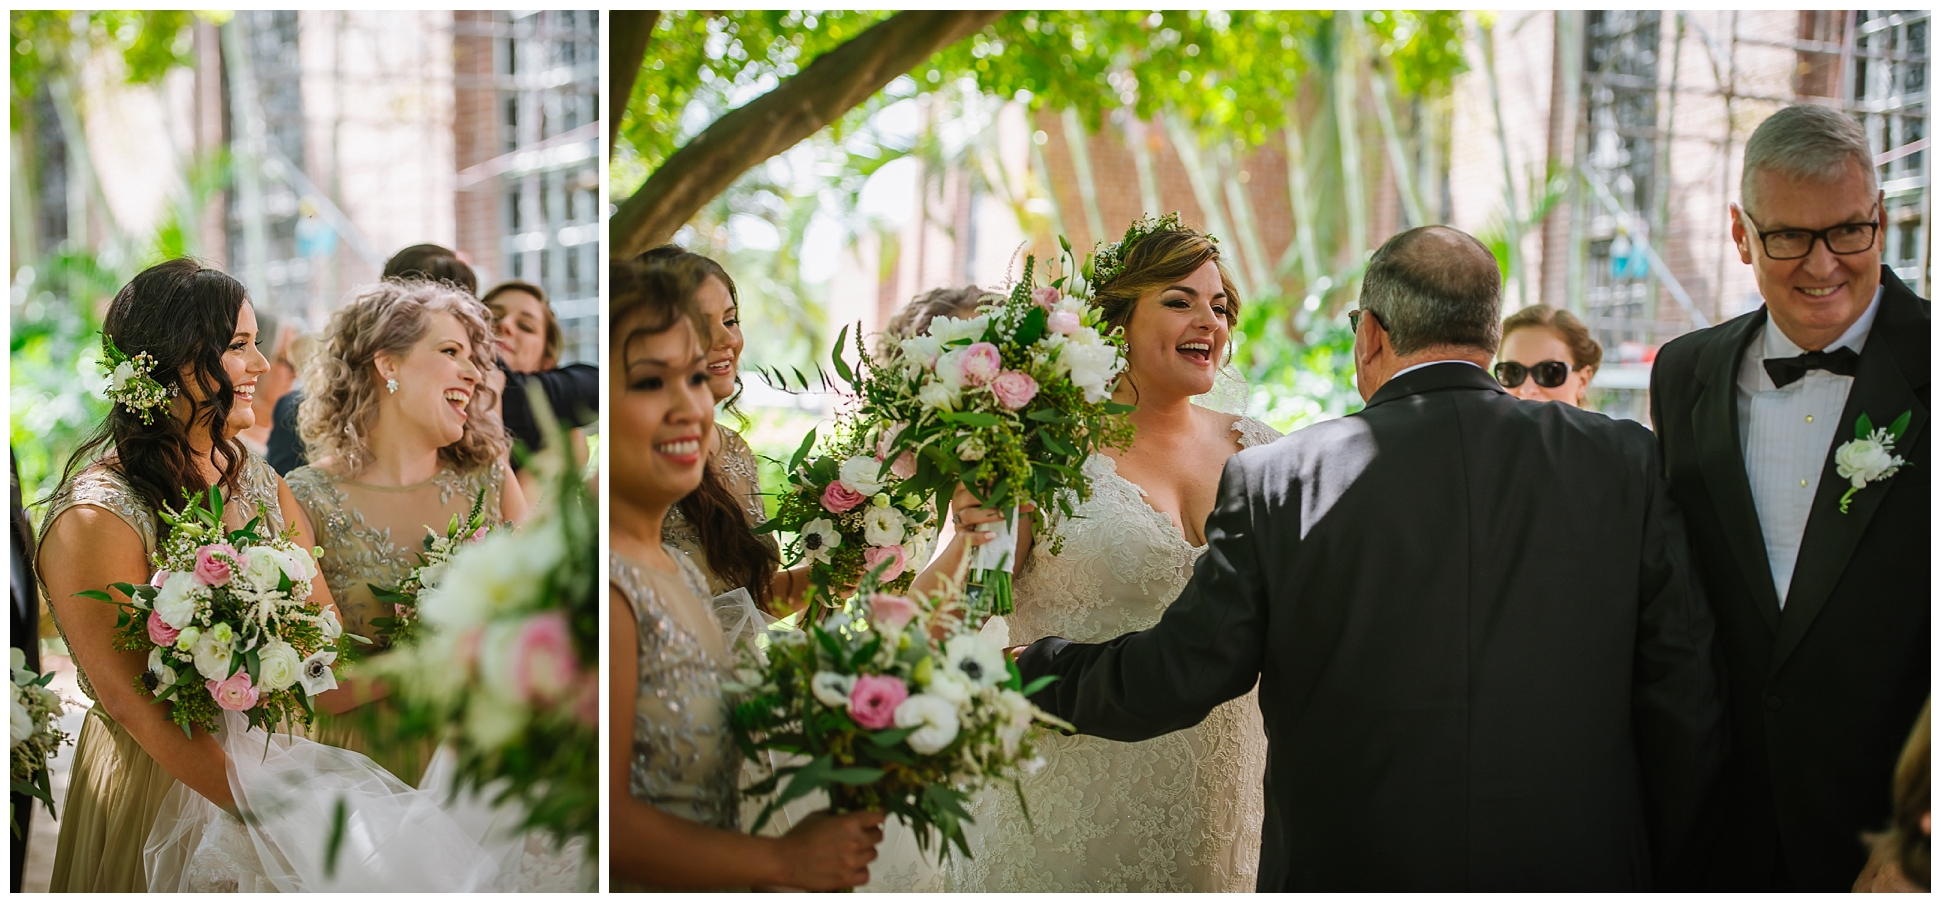 st-pete-wedding-photographer-italian-romance-theme-rustic-flower-crown_0403.jpg